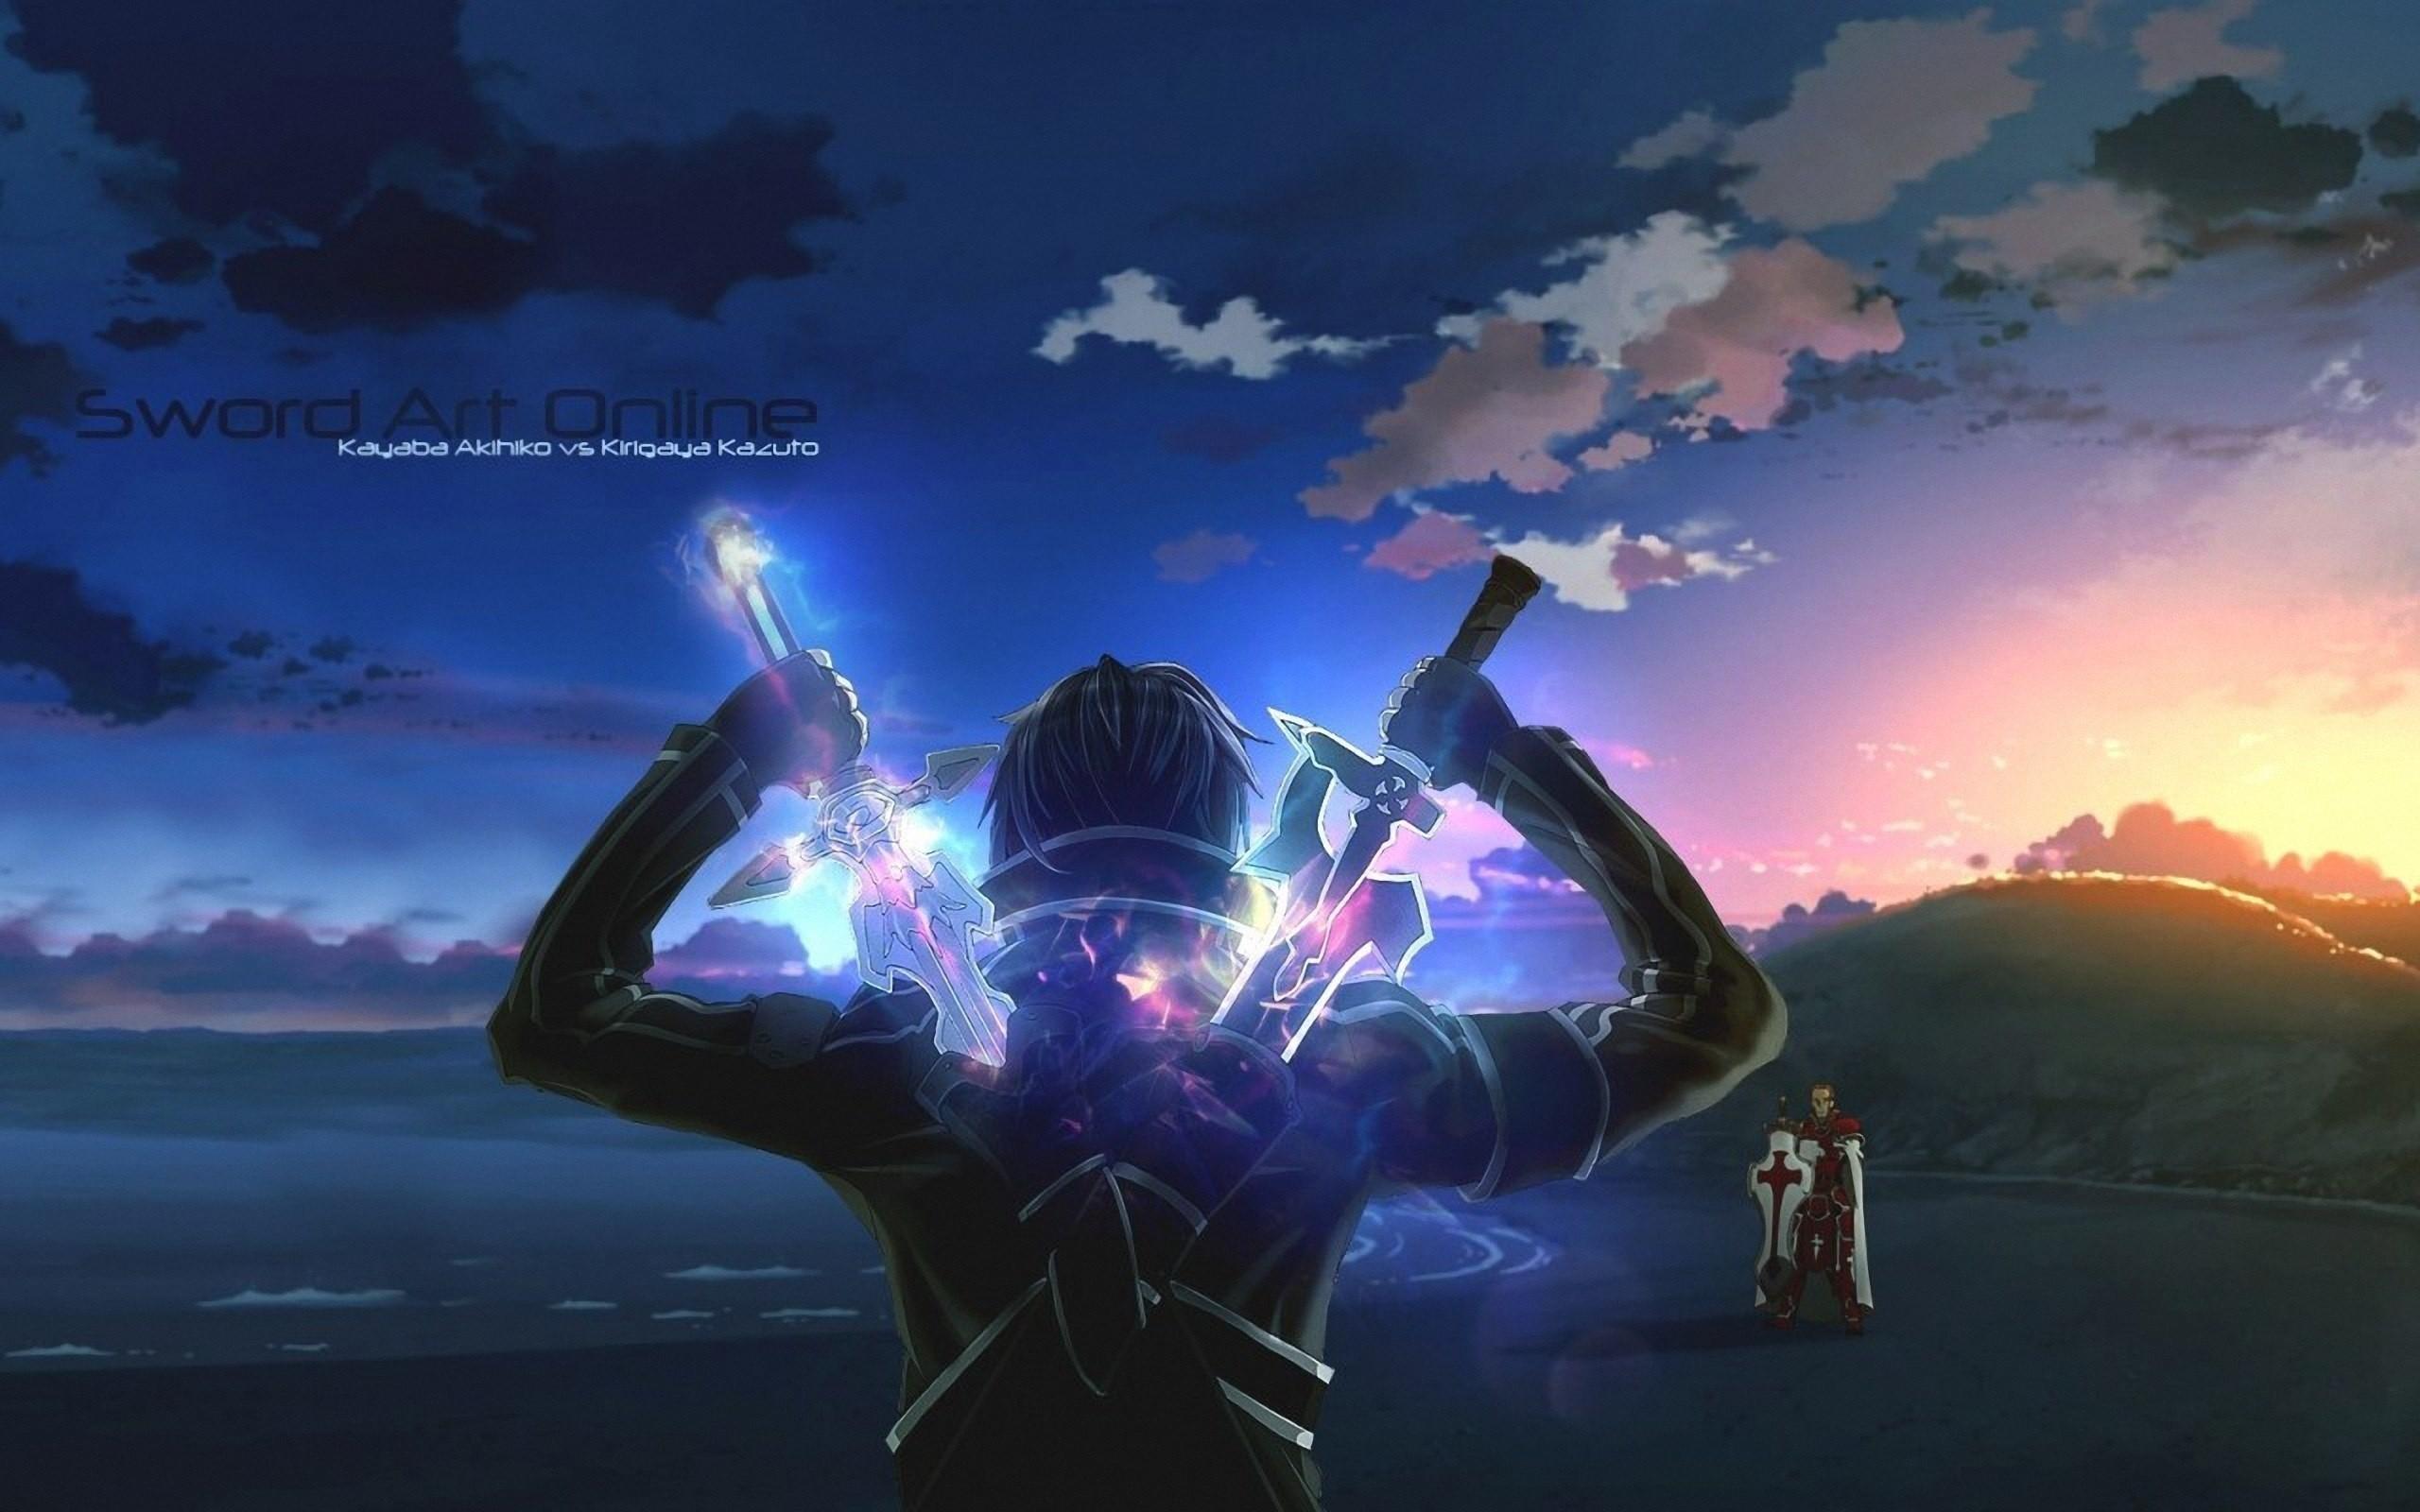 Wallpaper Anime Space Sky Sword Art Online Kirigaya Kazuto Earth World Cloud Darkness Screenshot 2560x1600 Px Computer Atmosphere Of